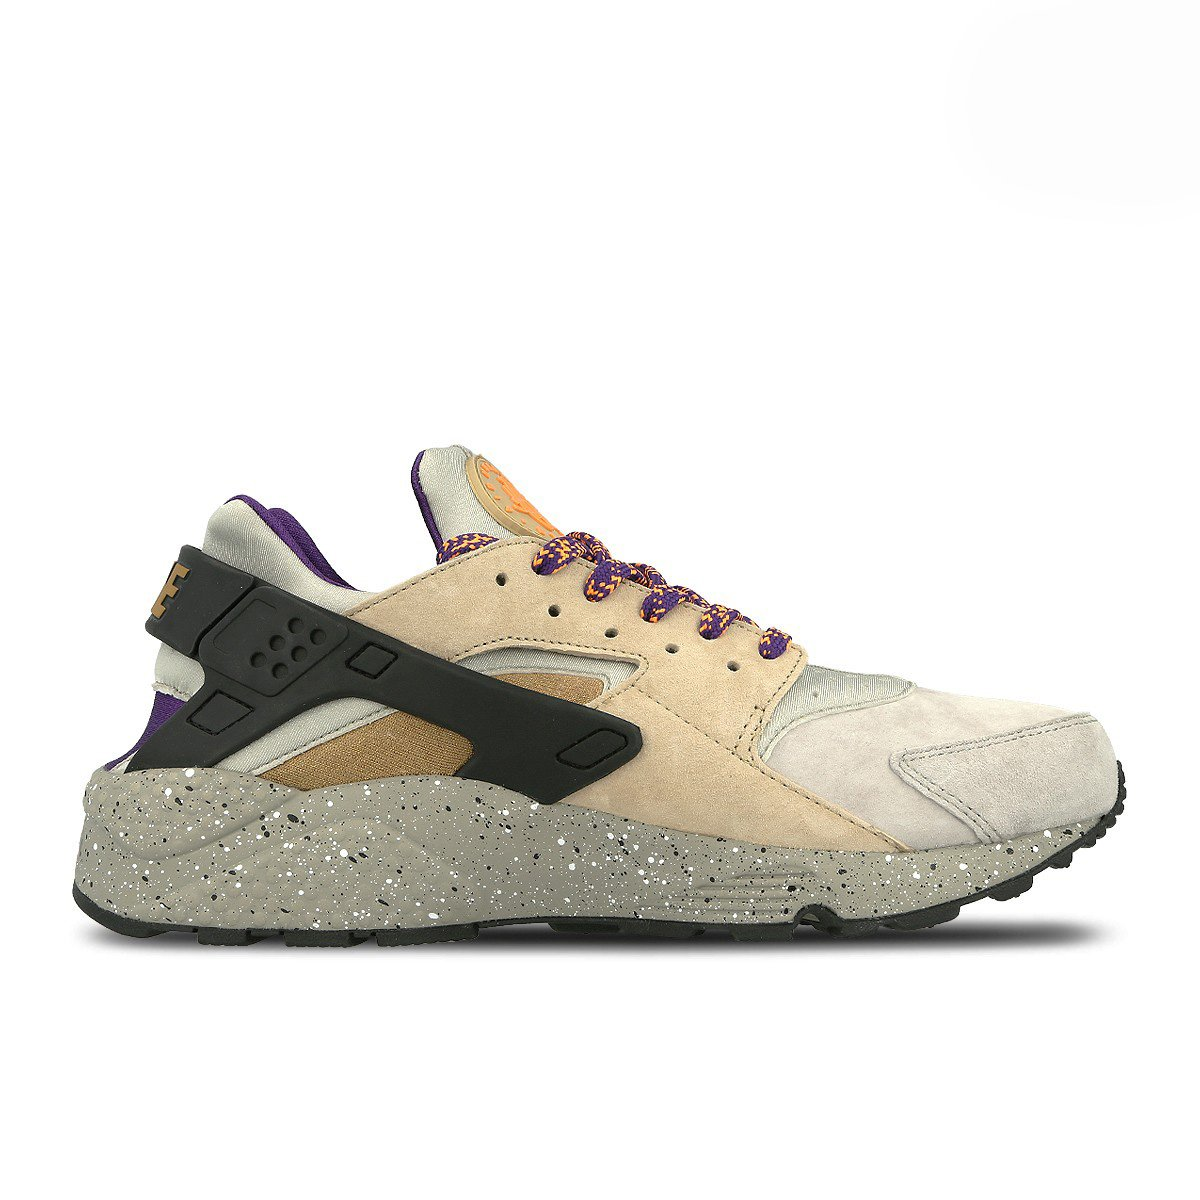 542f39dd81bf Nike Air Huarache Run Premium 704830-200 Linen Golden Beige -Black -Court  Purple